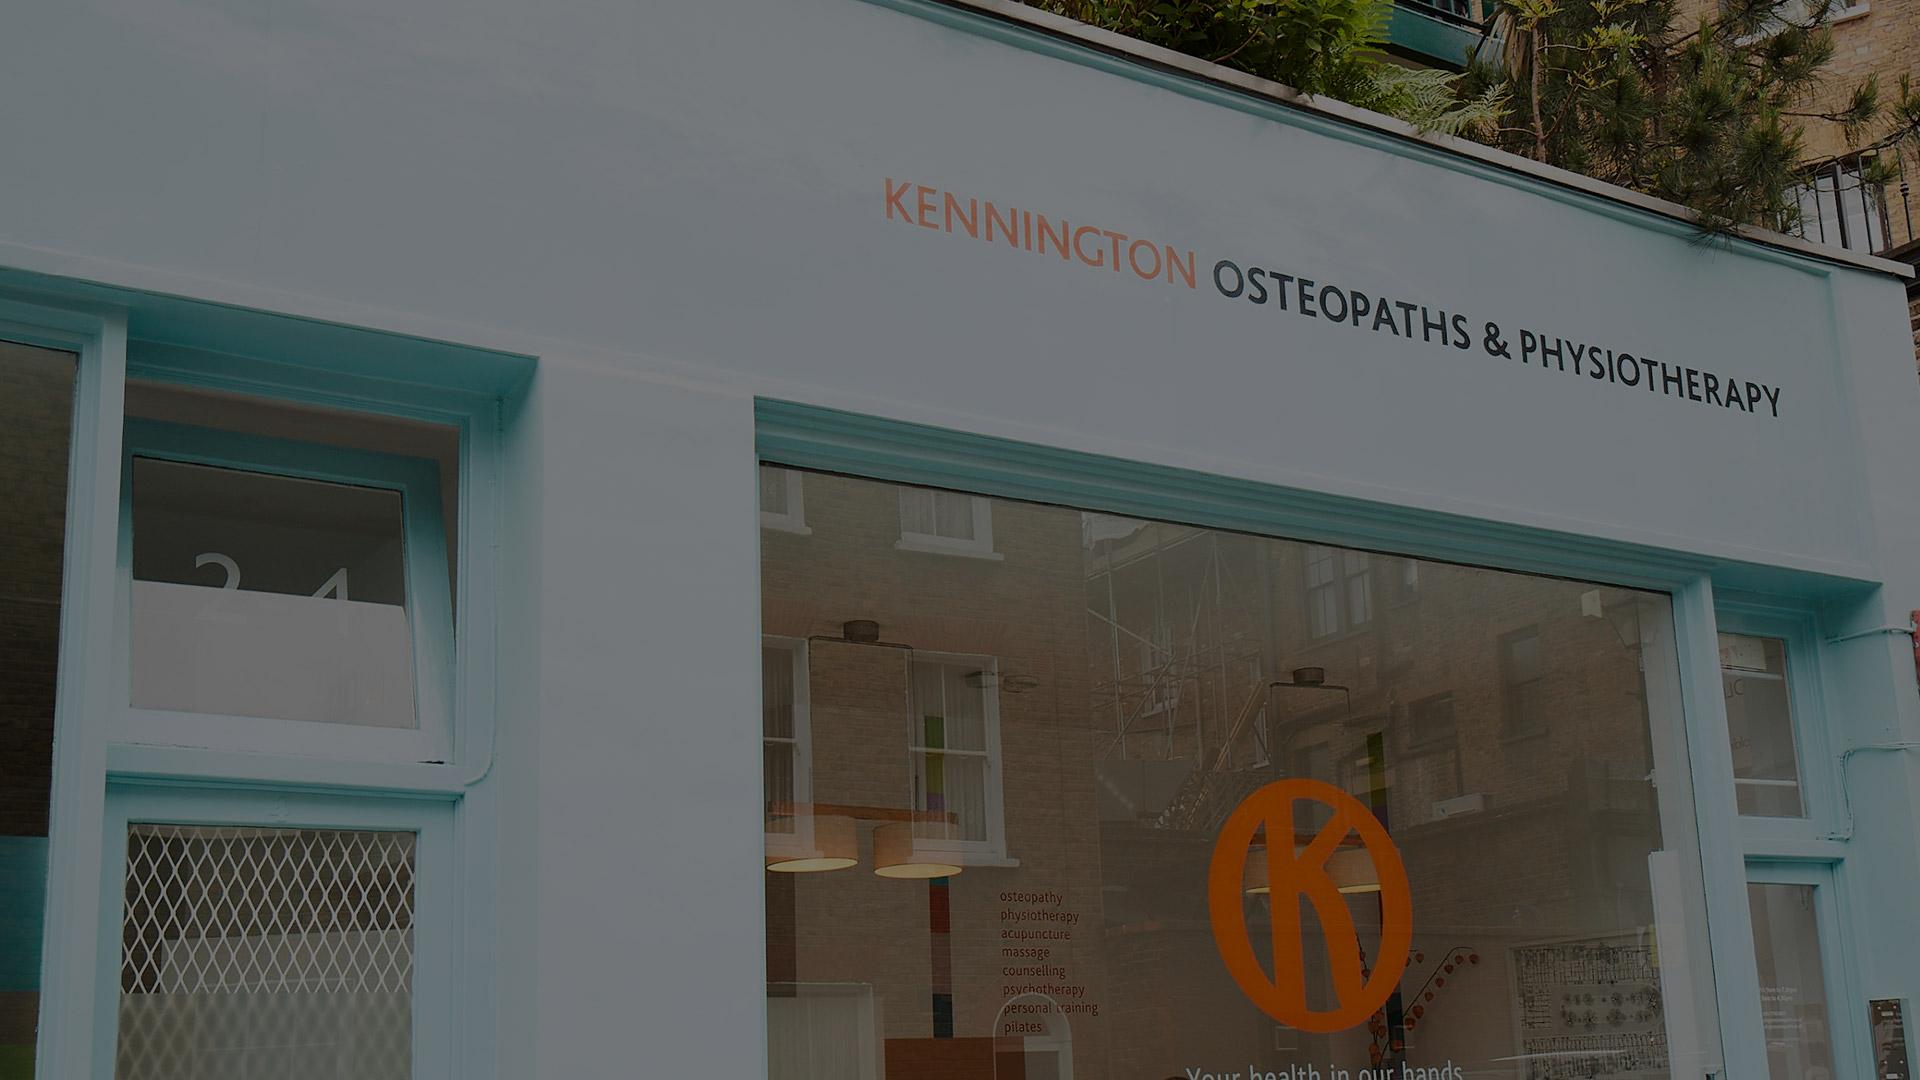 Kennington Osteopaths & Physiotherapy